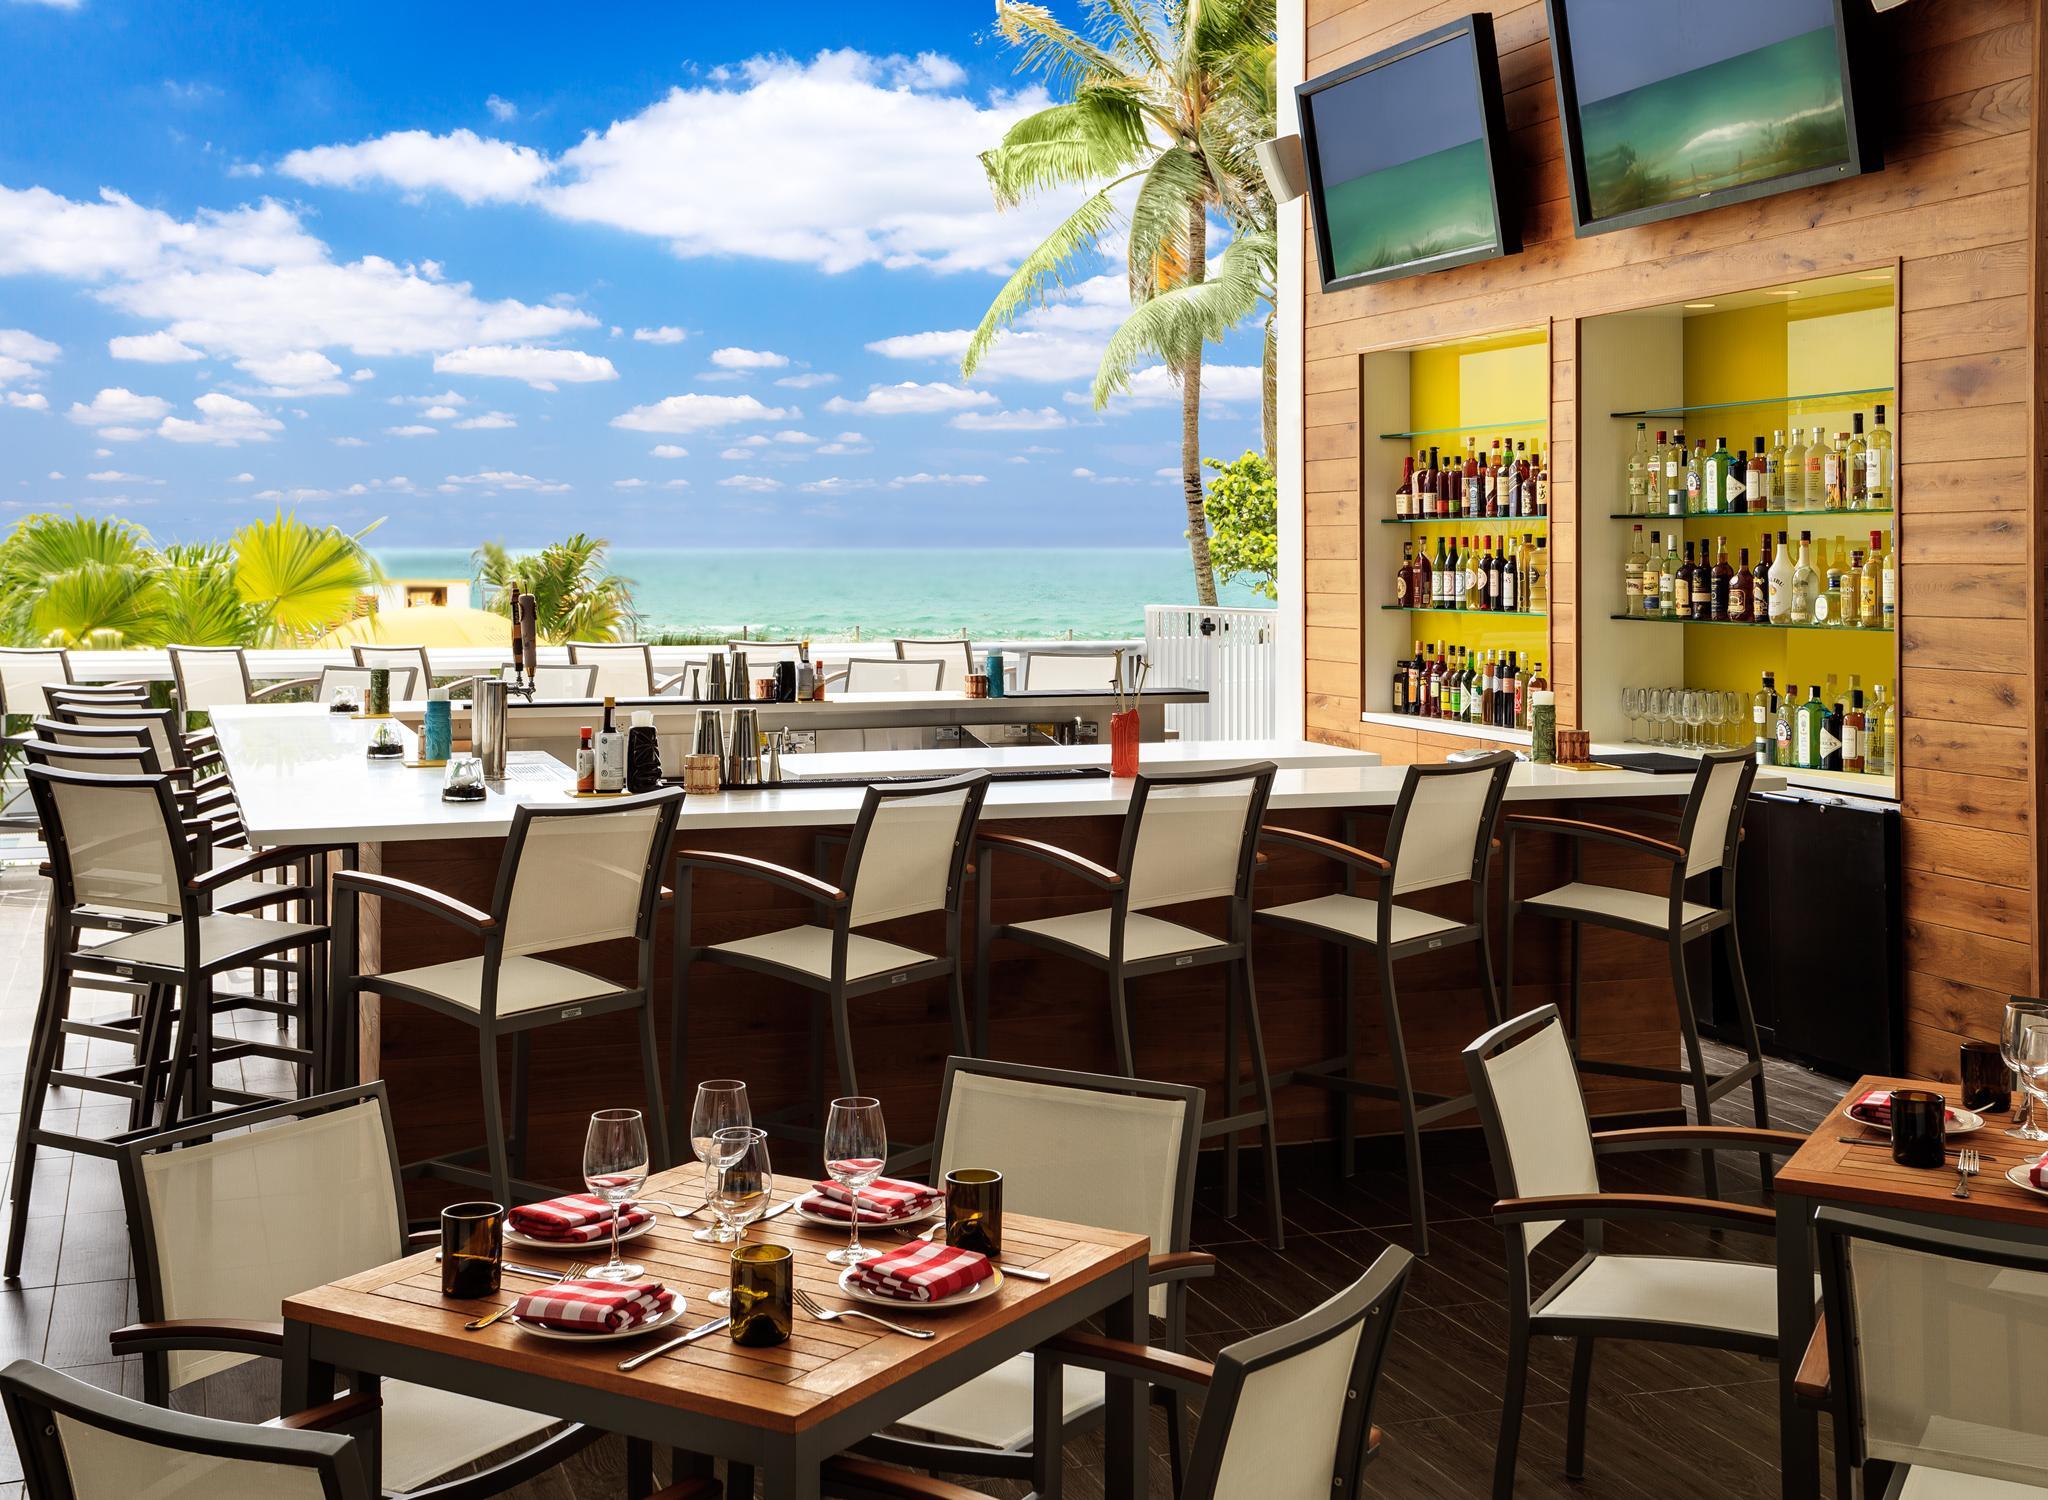 Hoteles en Miami Beach Hotel Hilton Cabana Miami Beach Miami